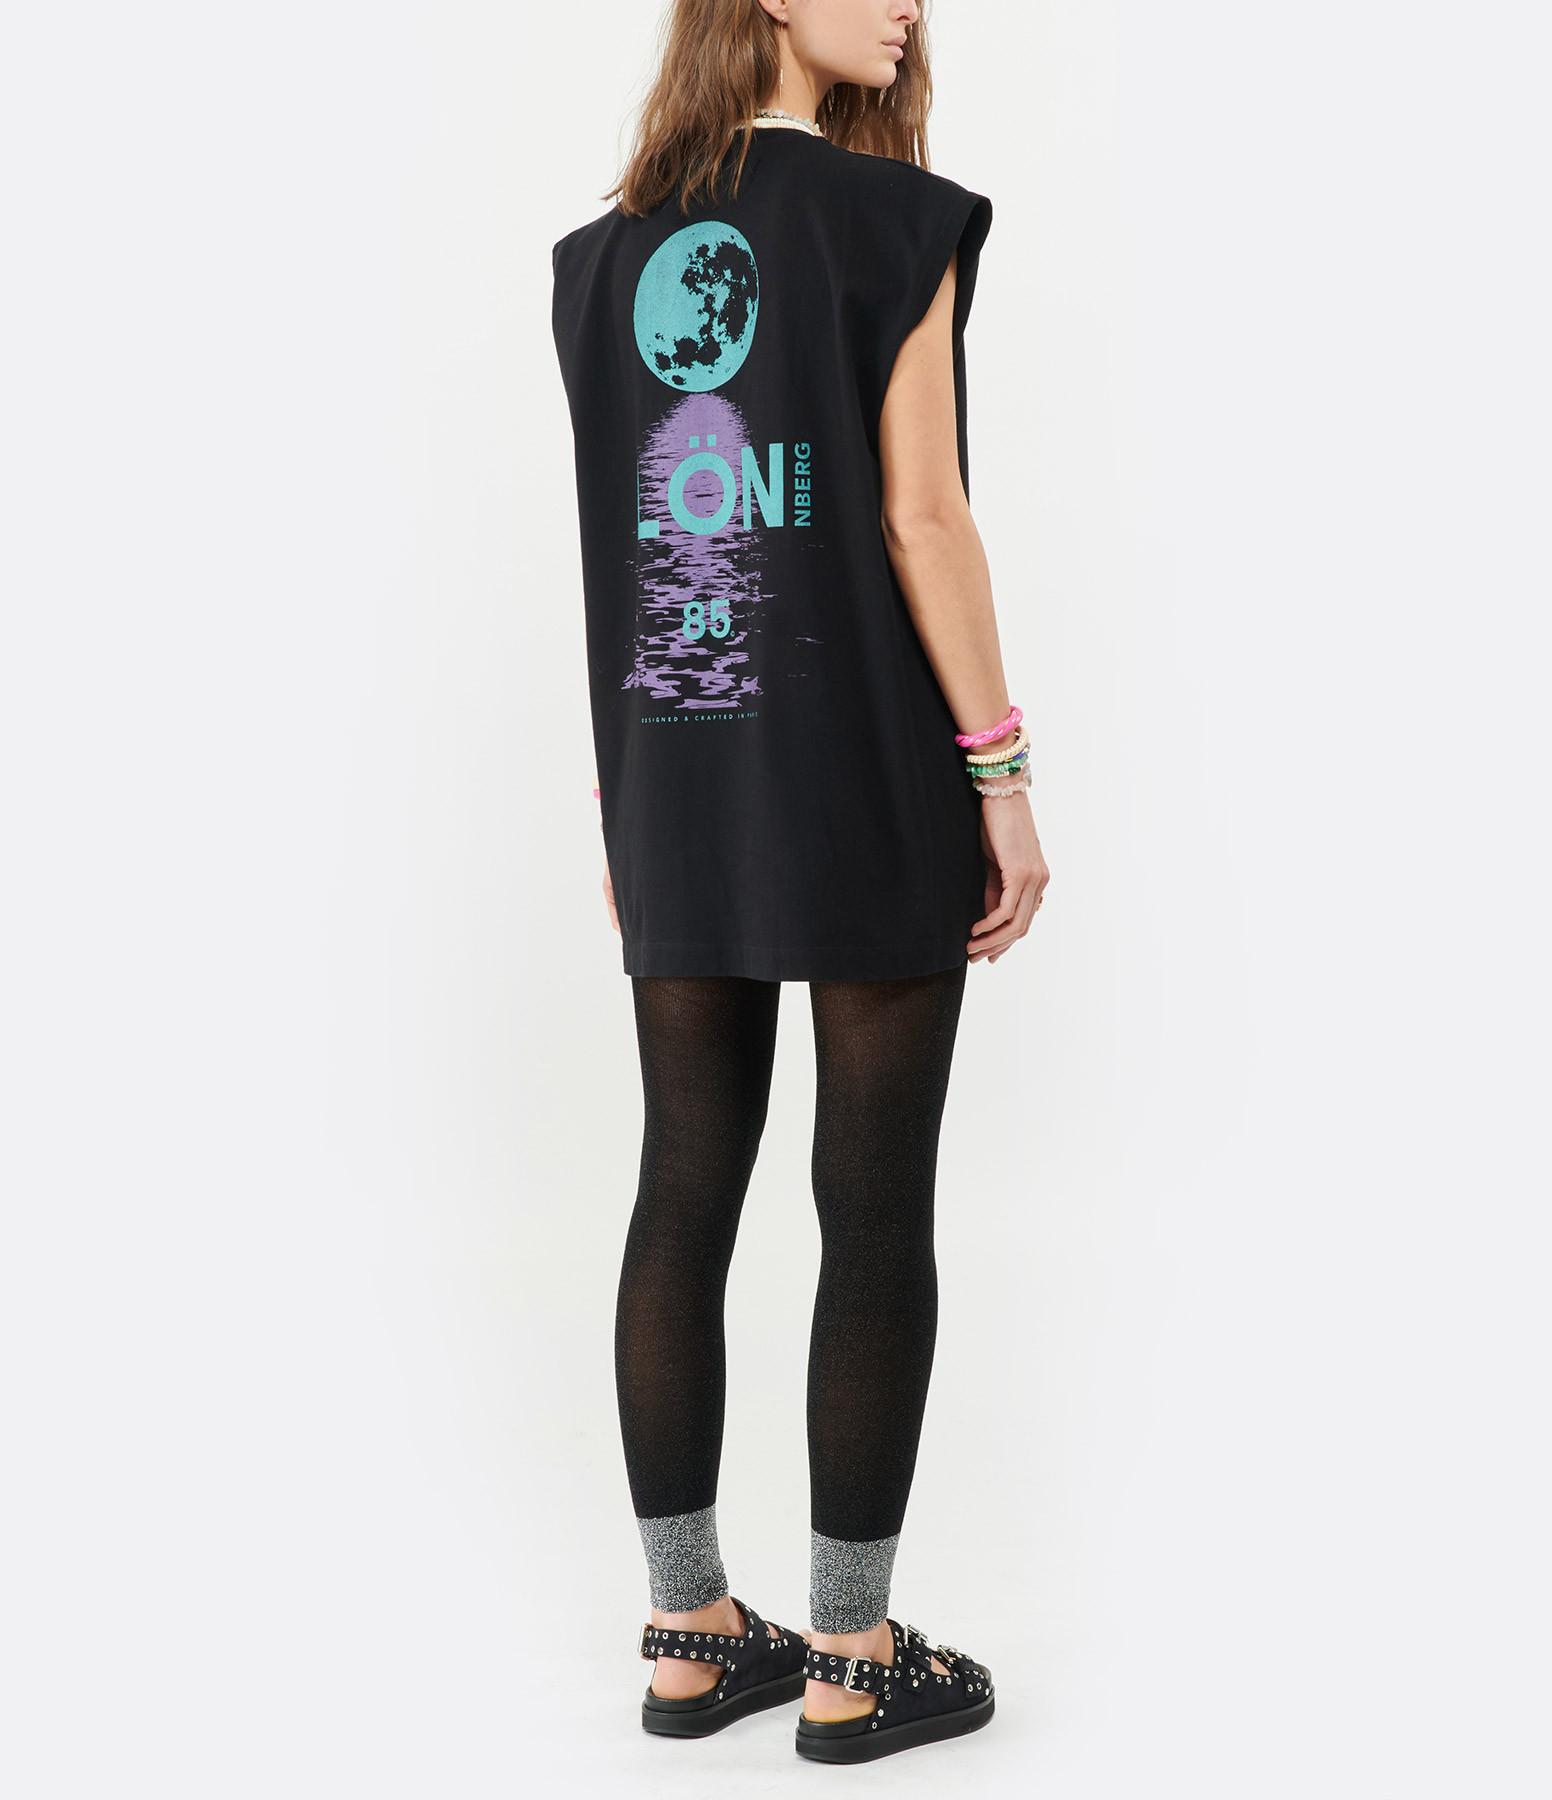 MARGAUX LONNBERG - Tee-shirt Rio Imprimé Noir